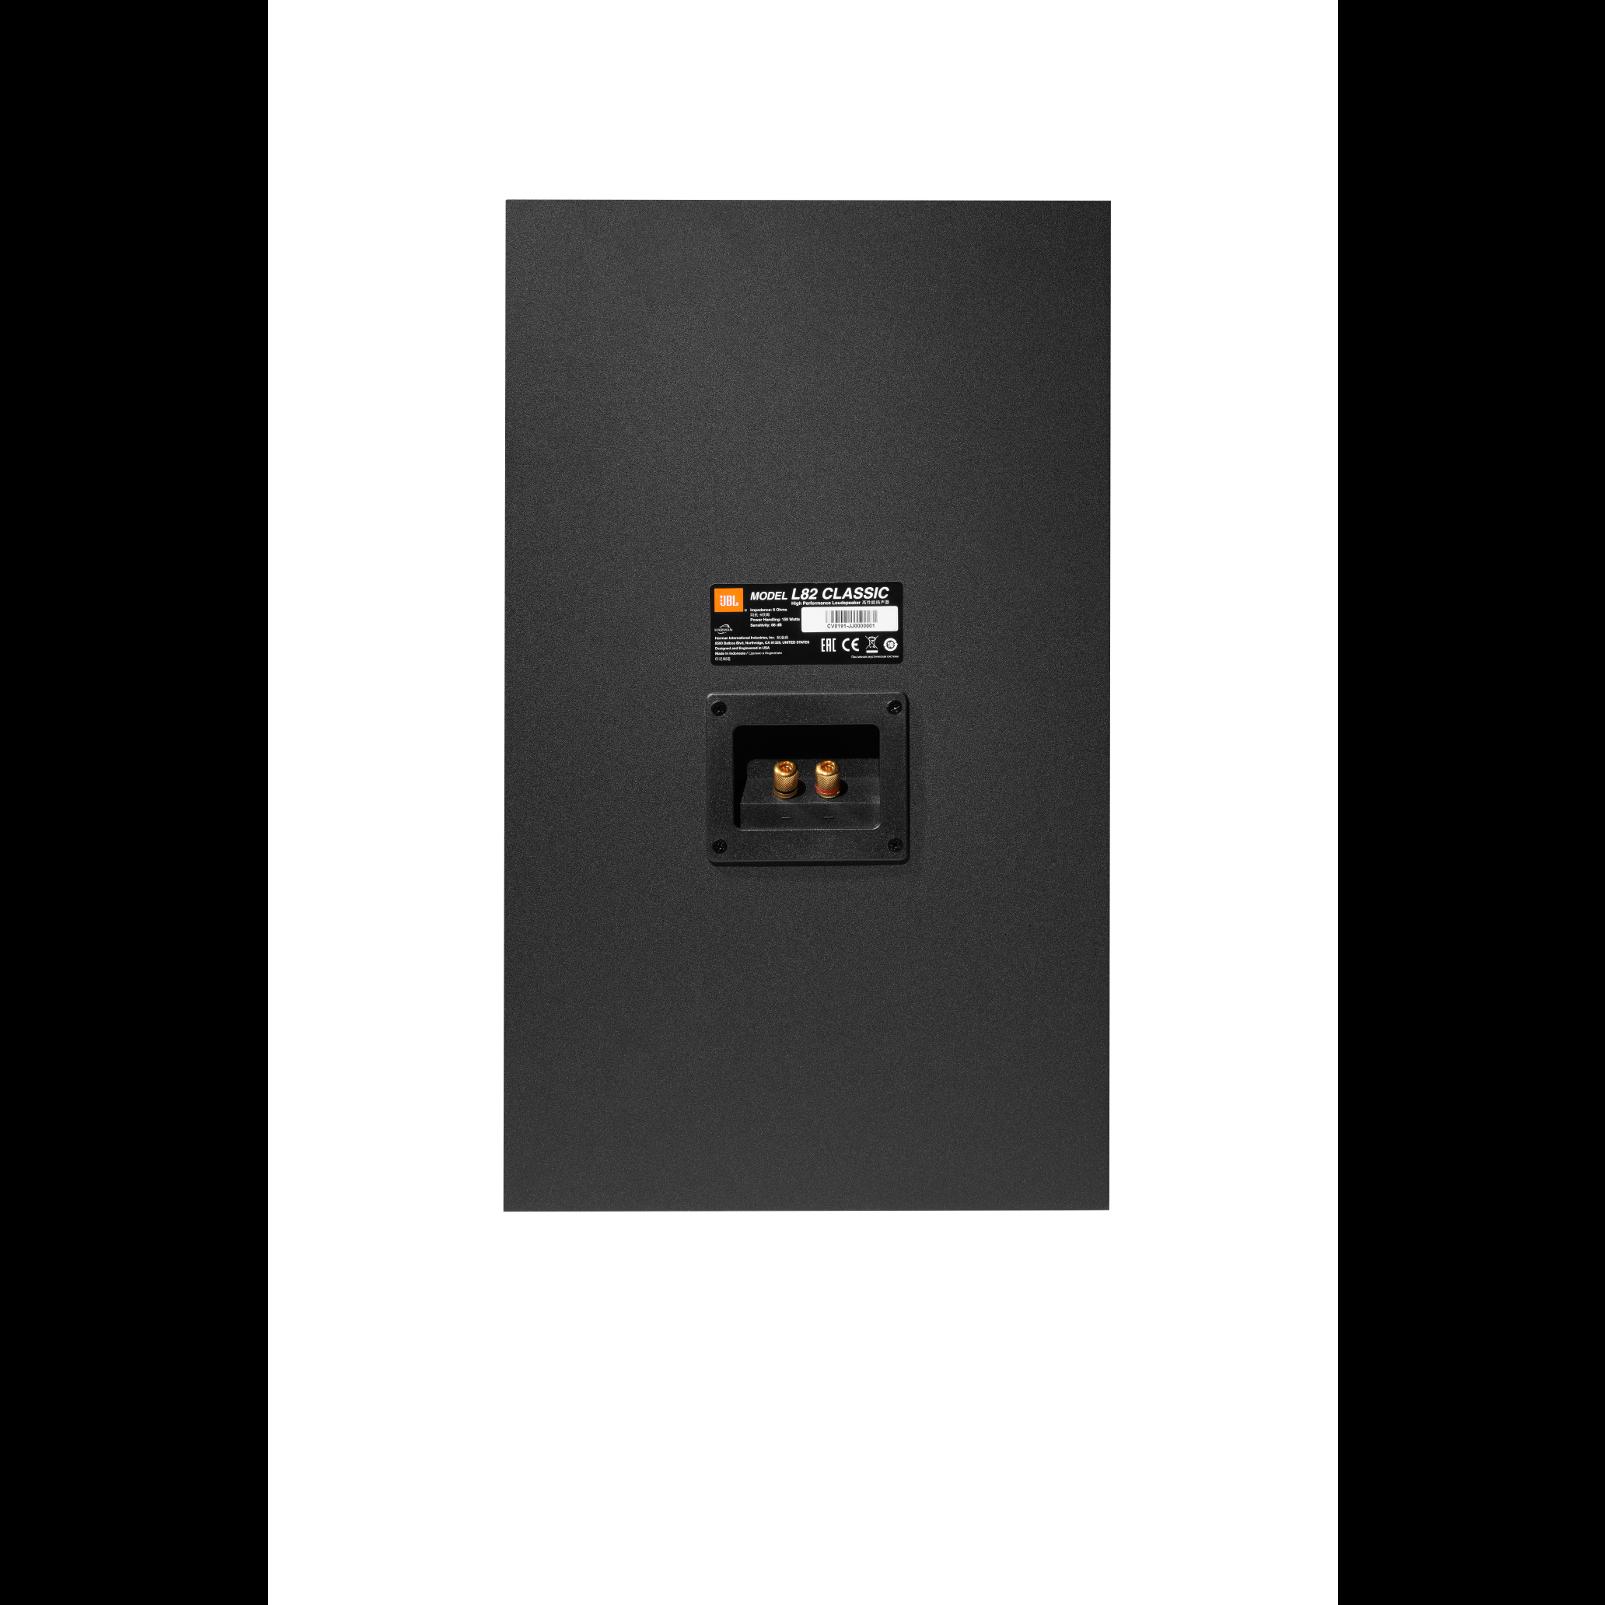 L82 Classic - Orange - 2-way 8-inch (200mm) Bookshelf Loudspeaker - Back